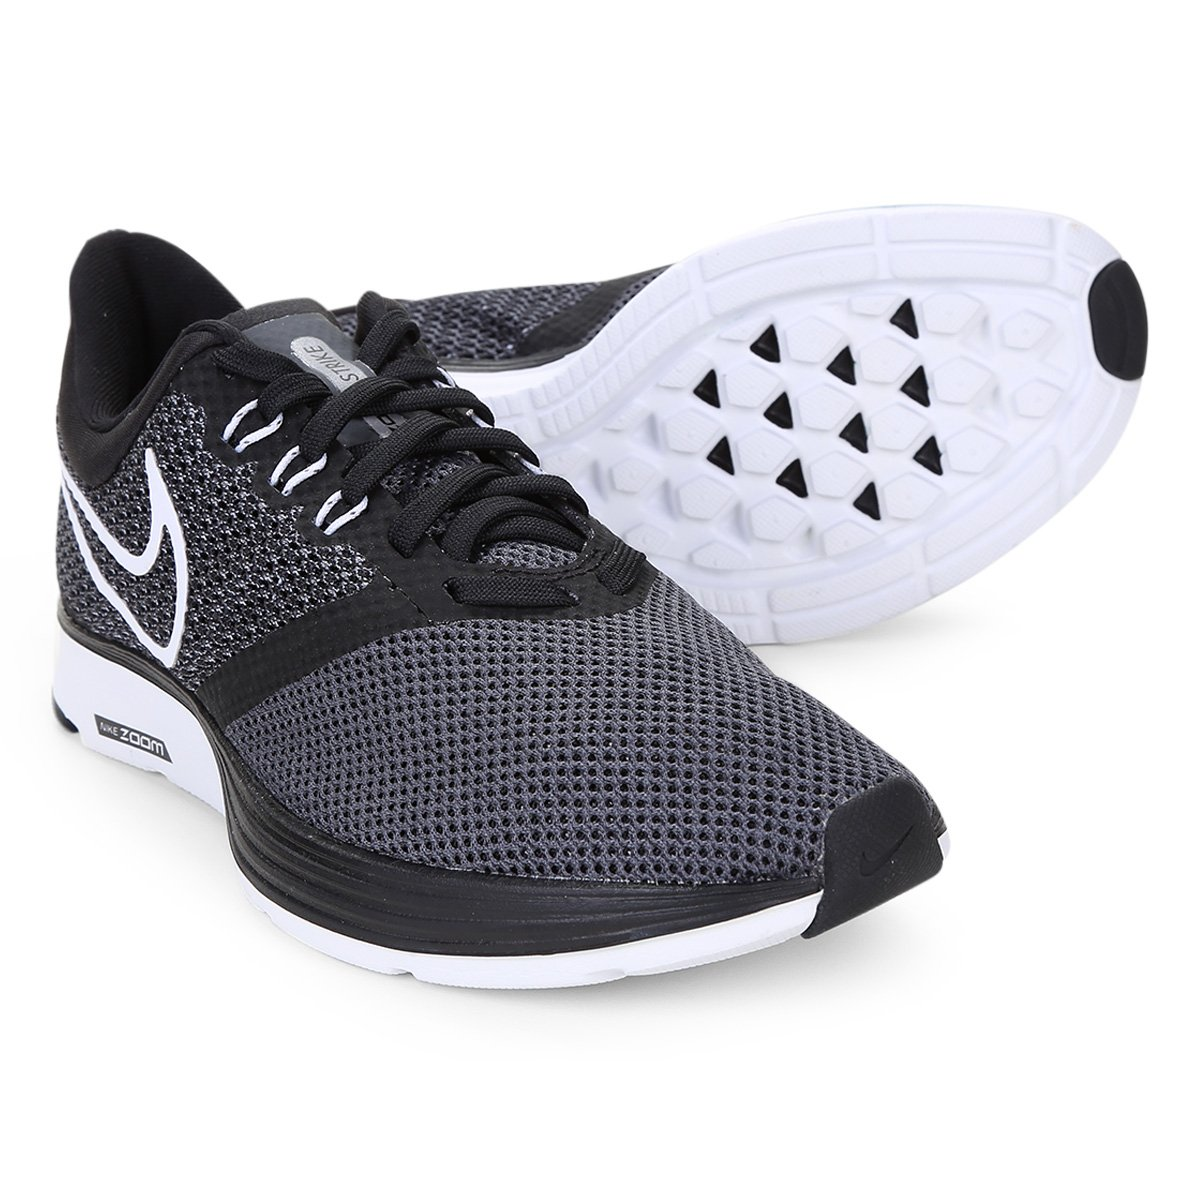 Tênis Nike Zoom Strike Feminino - Preto e Branco - Compre Agora ... a62b7e4b98d60